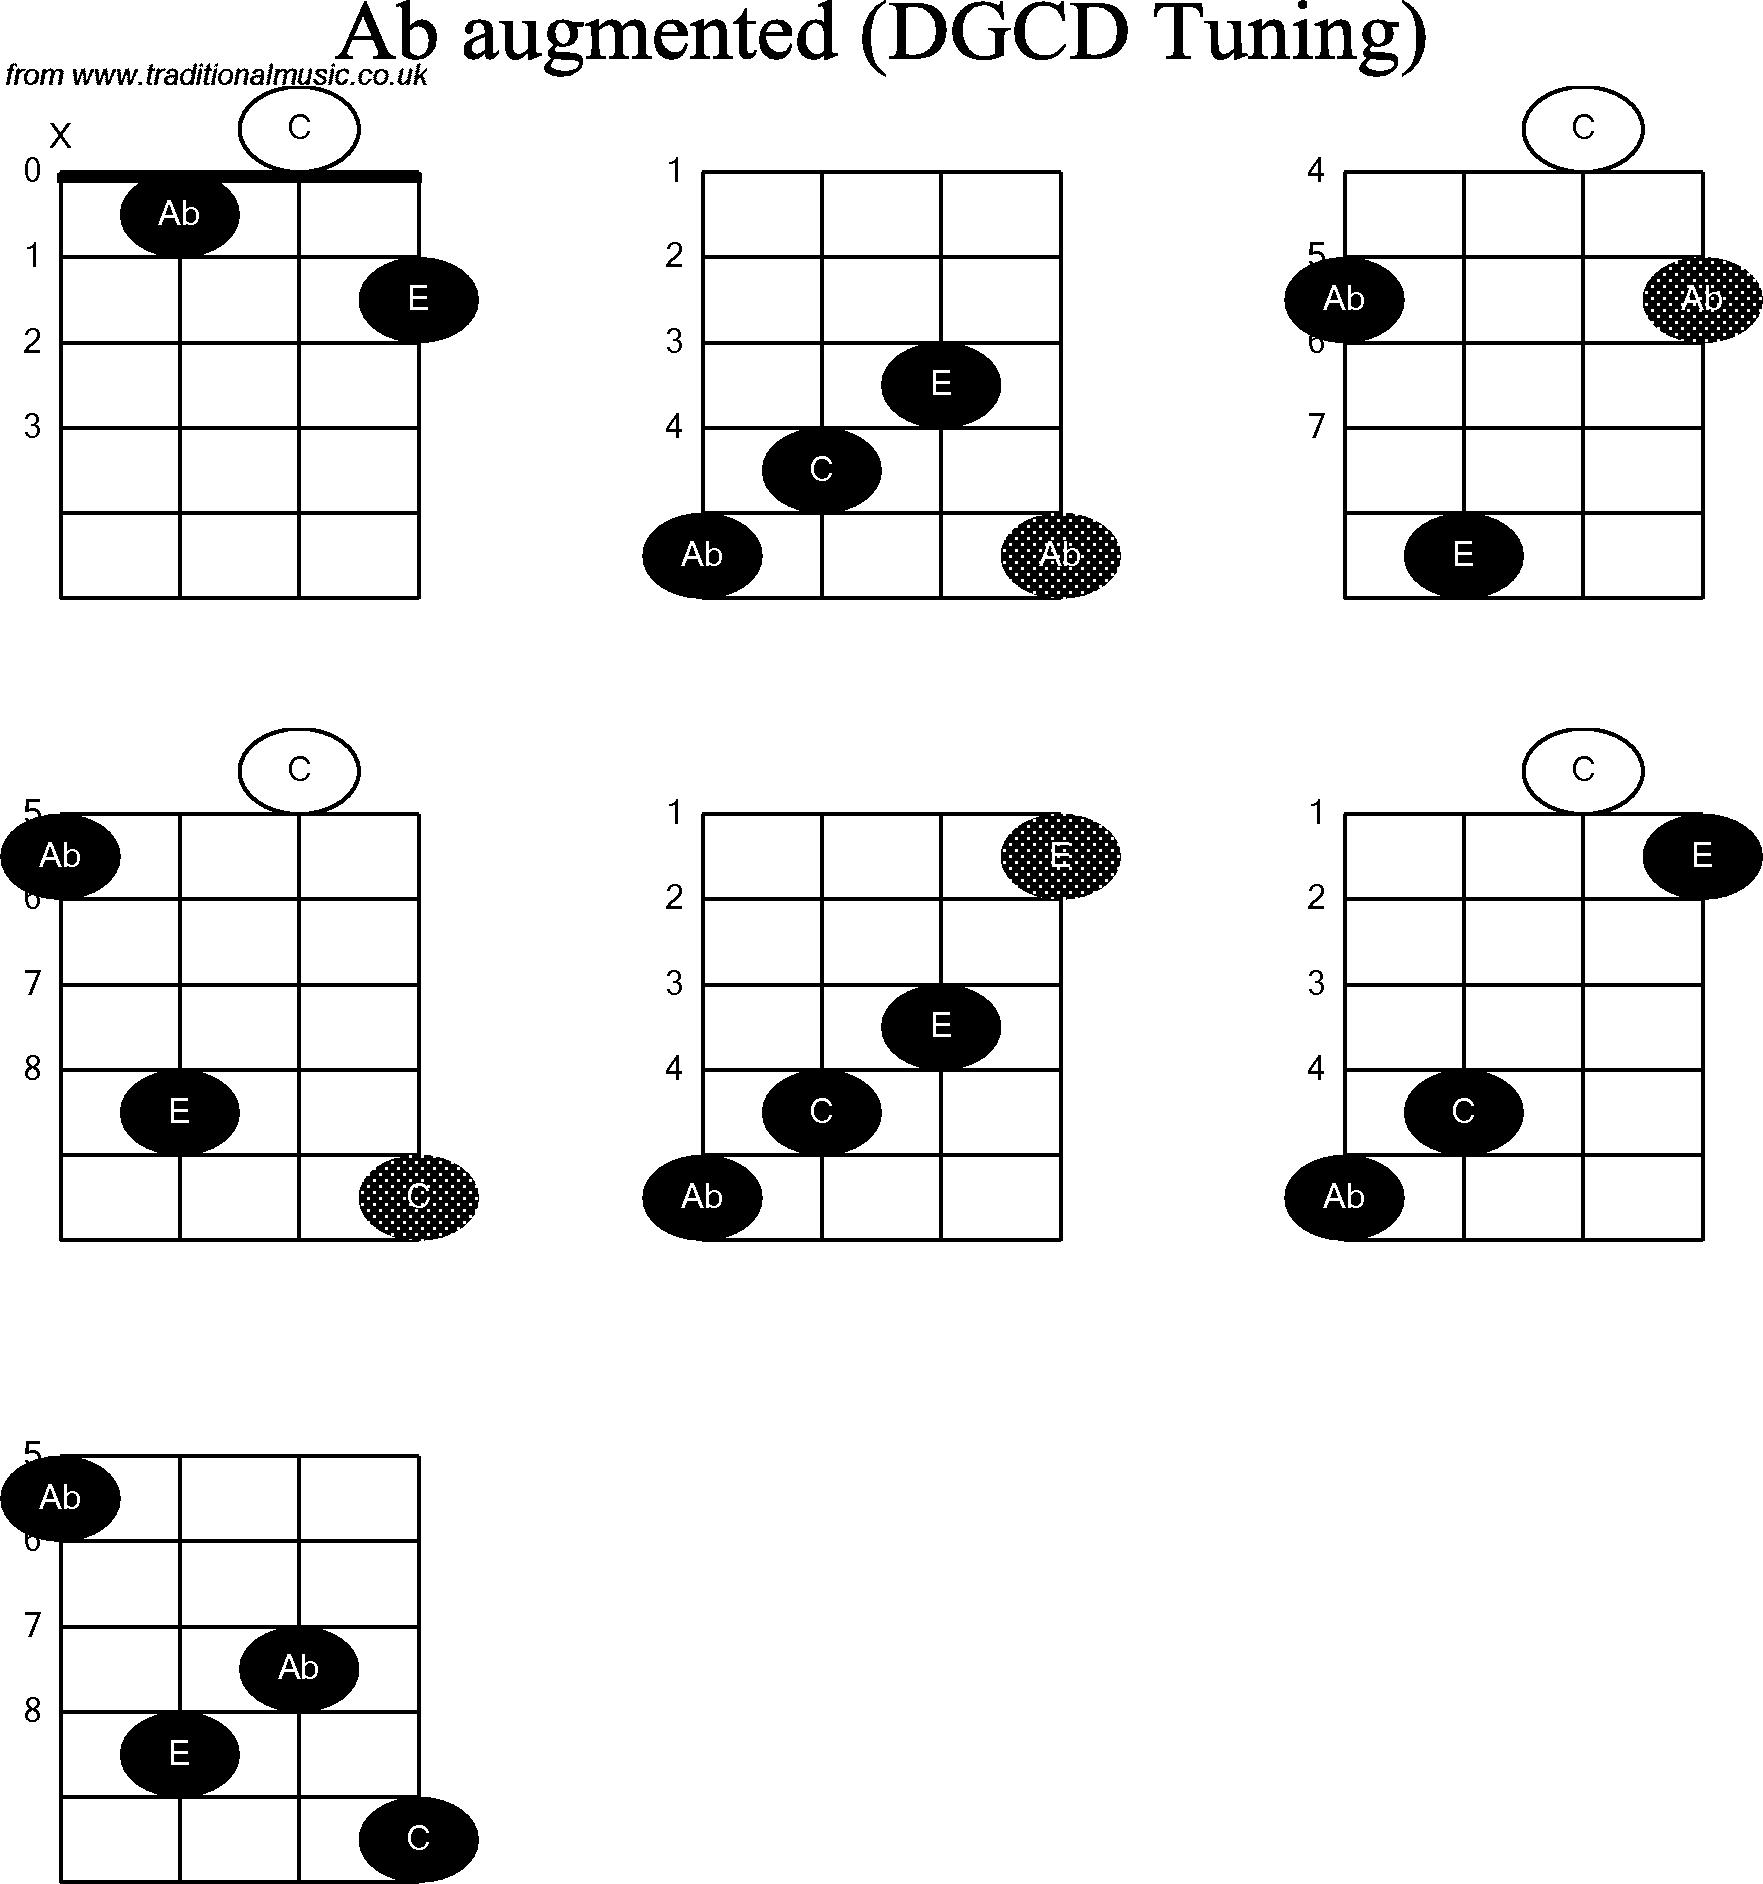 Chord diagrams for: Banjo(G Modal) Ab Augmented